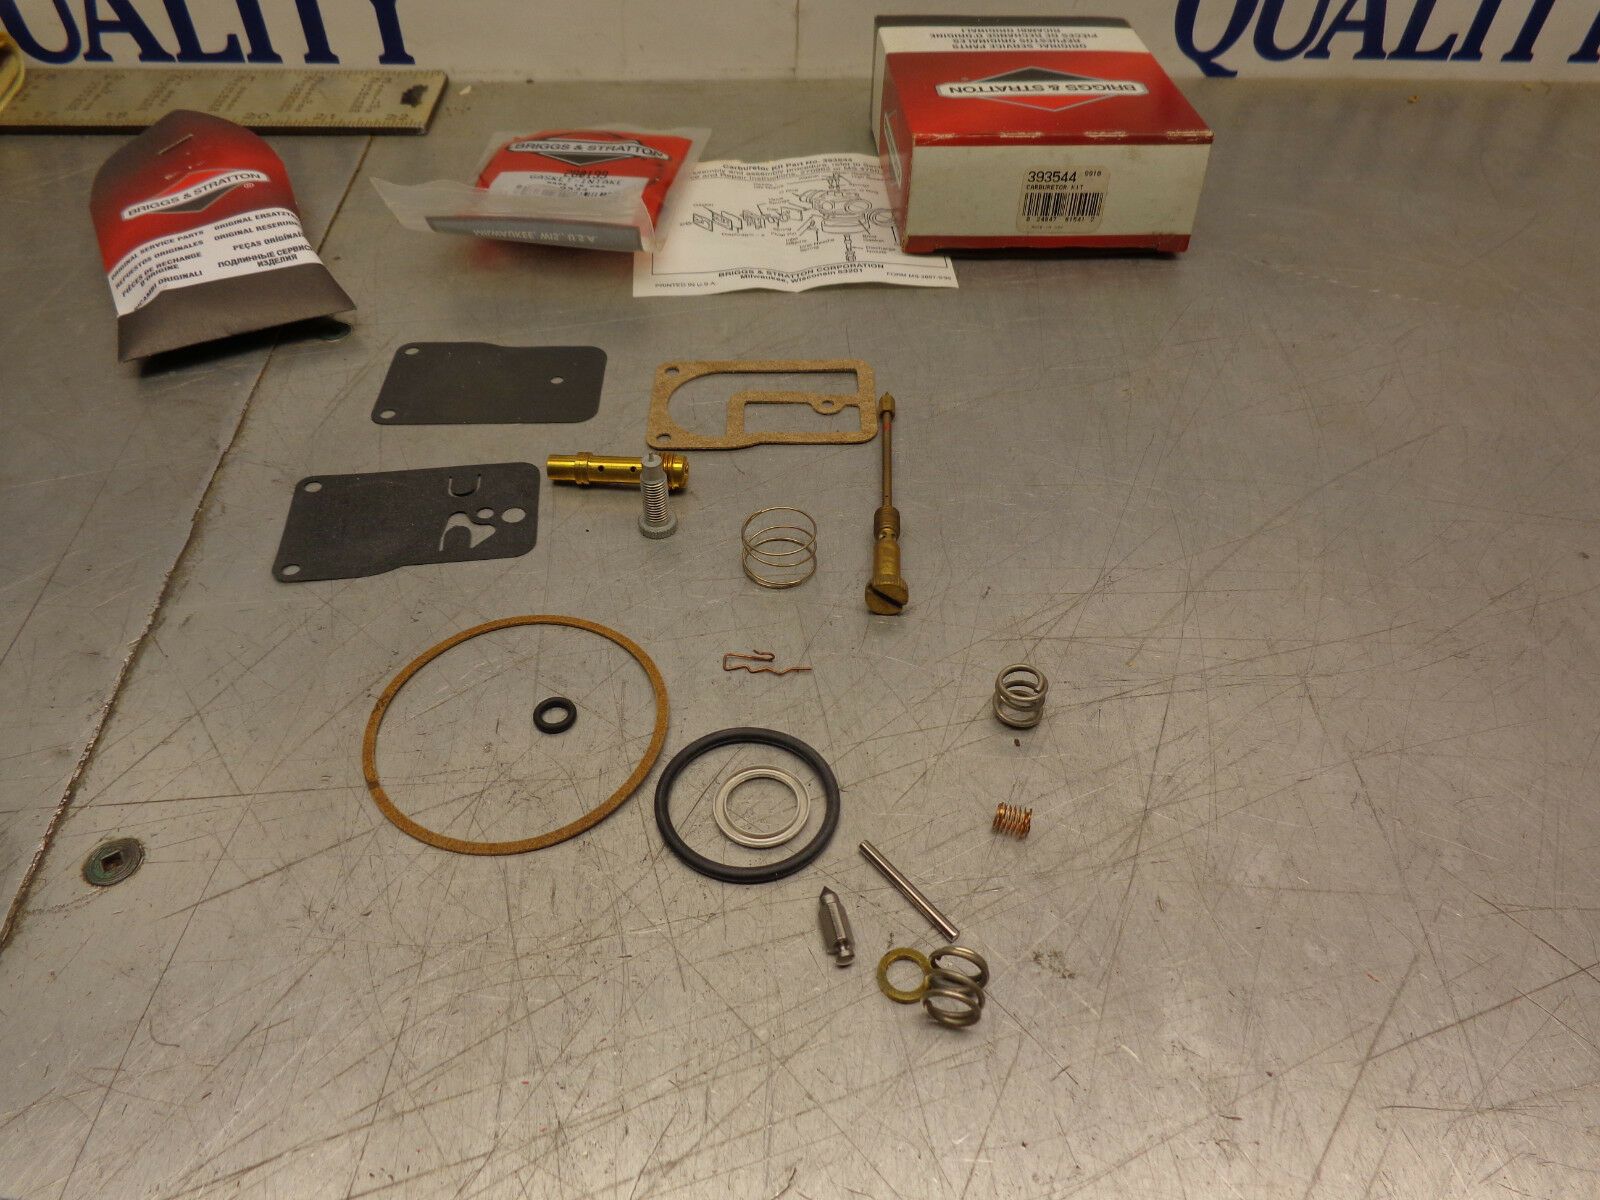 Original Equipment Manufacturer Briggs 393544 Cocheburador Reconstruir Revisión Kit para muchos 253417 2534 12 Serie